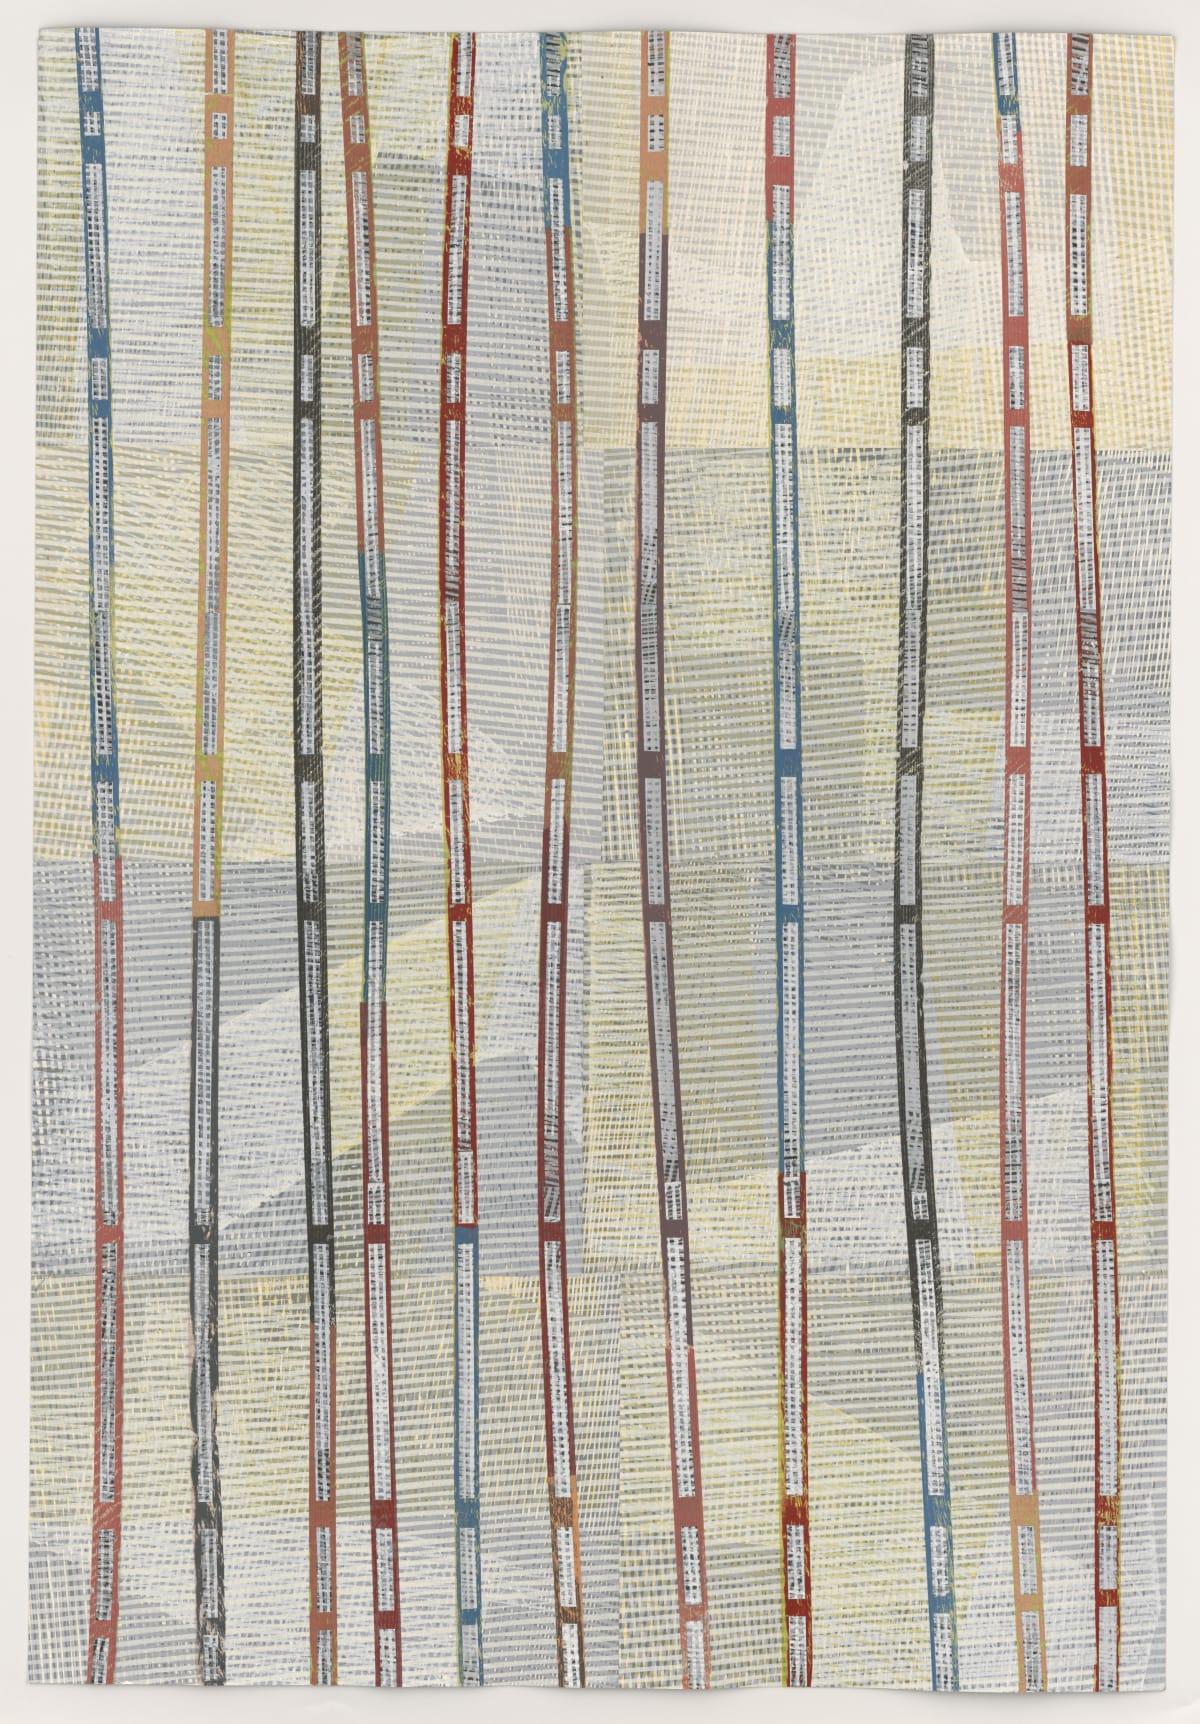 Steven Ford, Untitled (T0523B), 2019